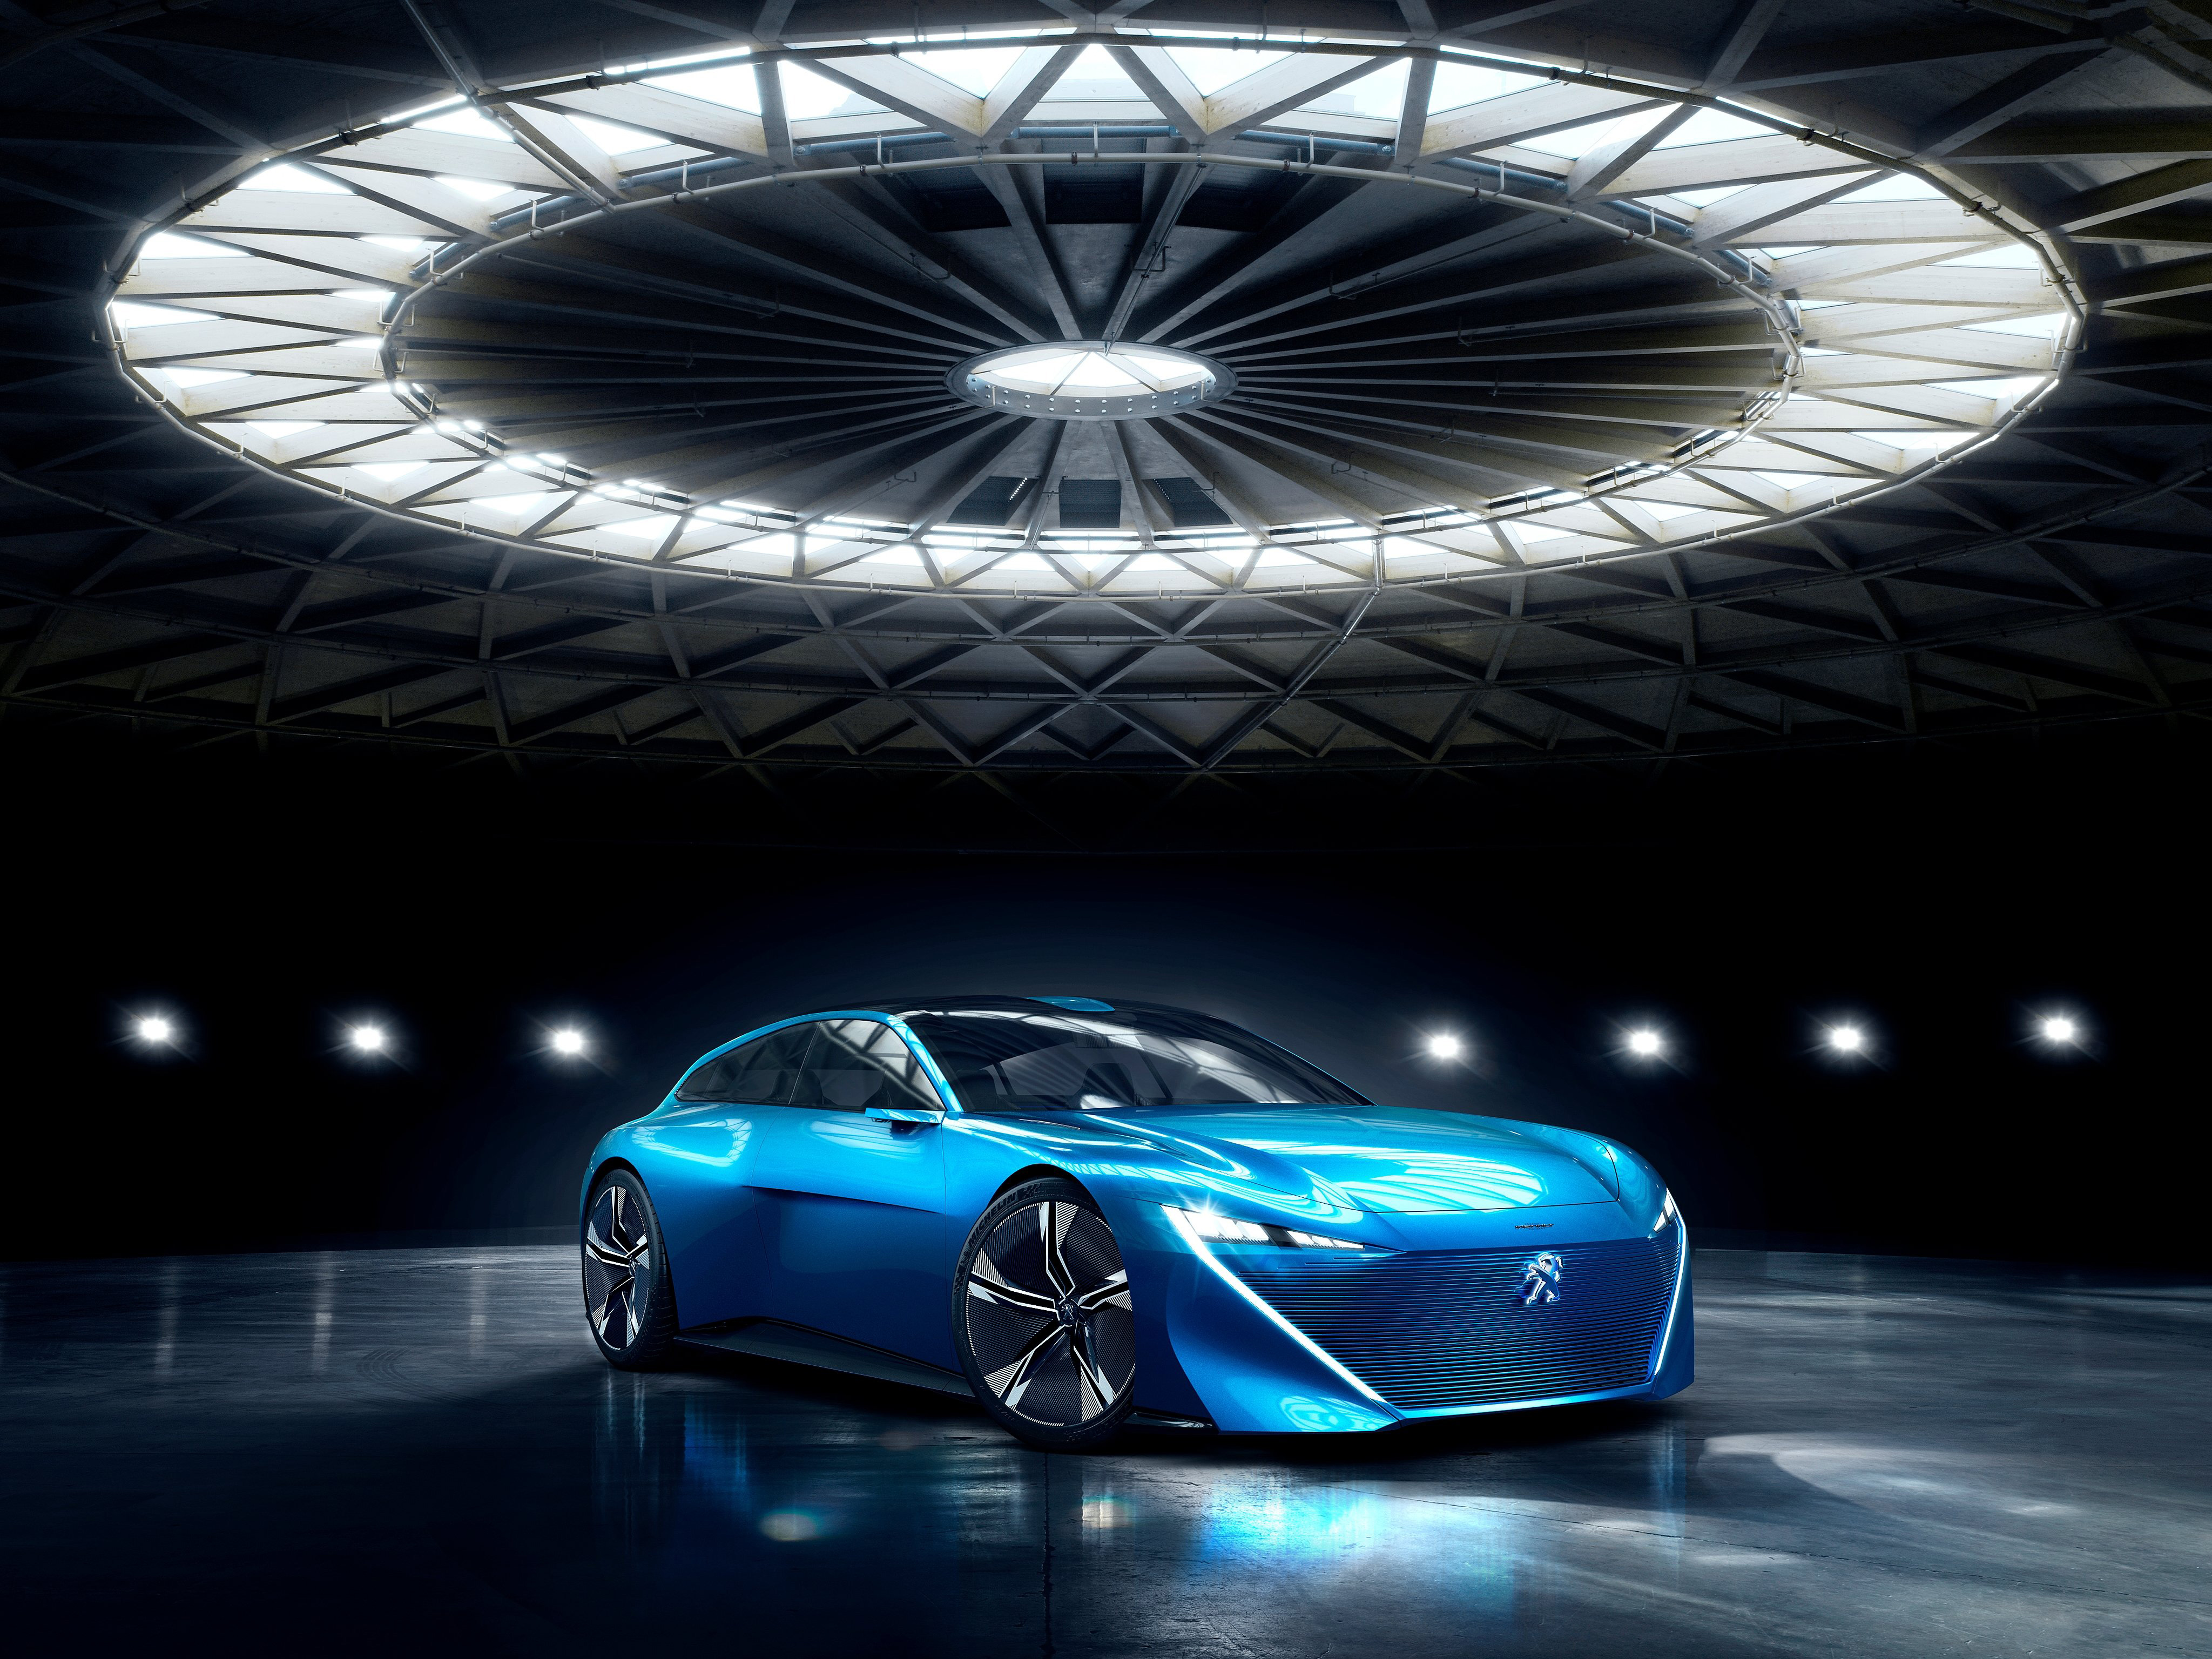 Peugeot Instinct Concept 2017 4k, HD Cars, 4k Wallpapers